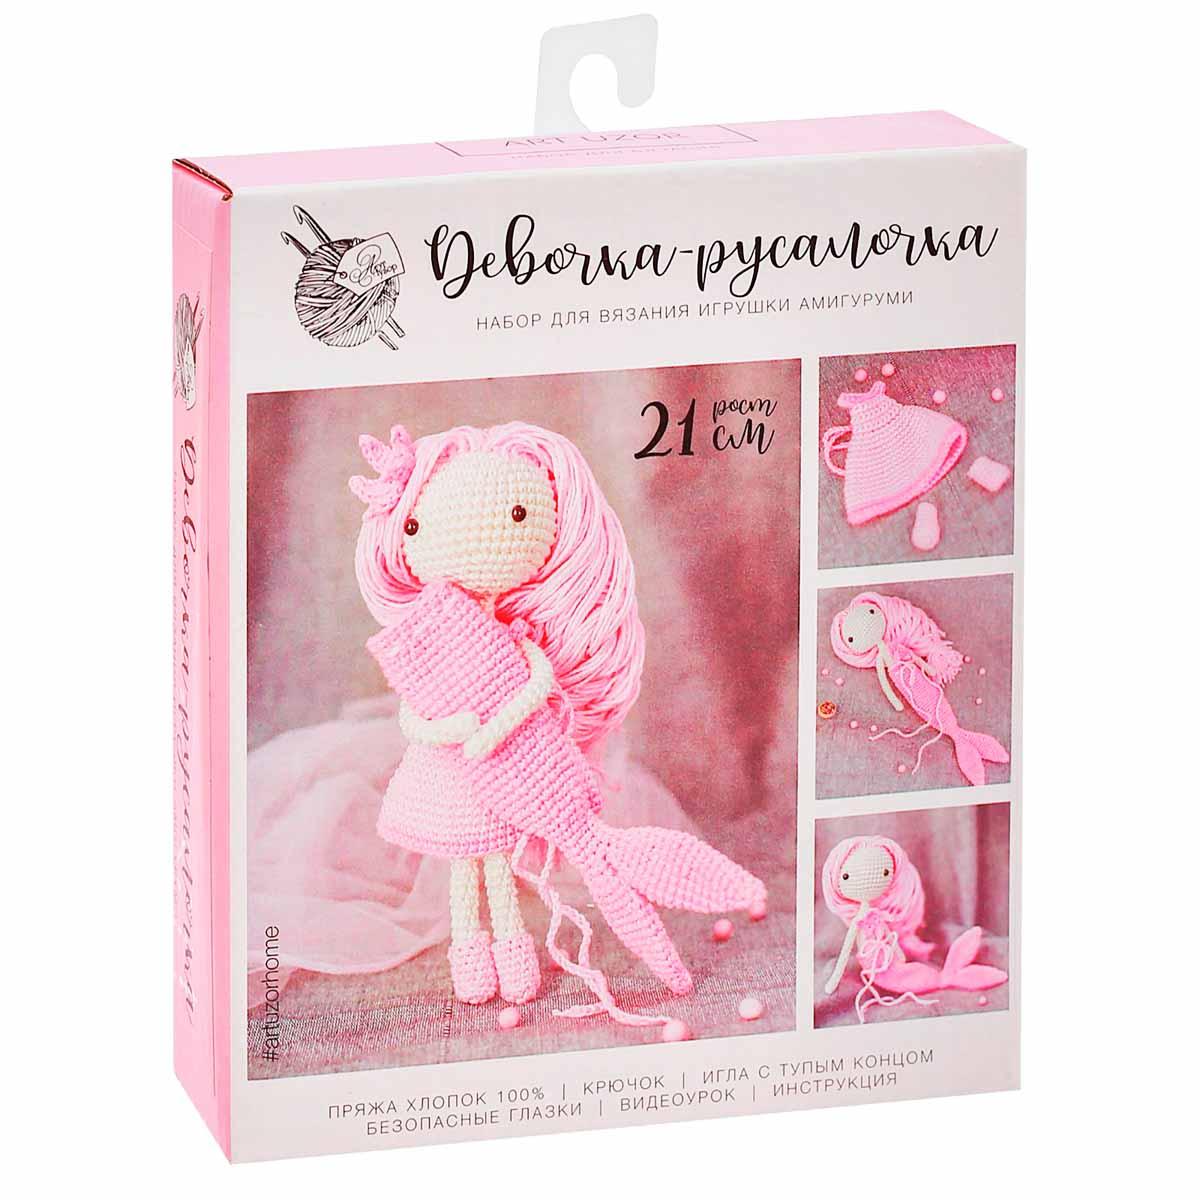 2724108 Амигуруми: Мягкая игрушка 'Девочка Русалочка', набор для вязания, 10*4*14 см